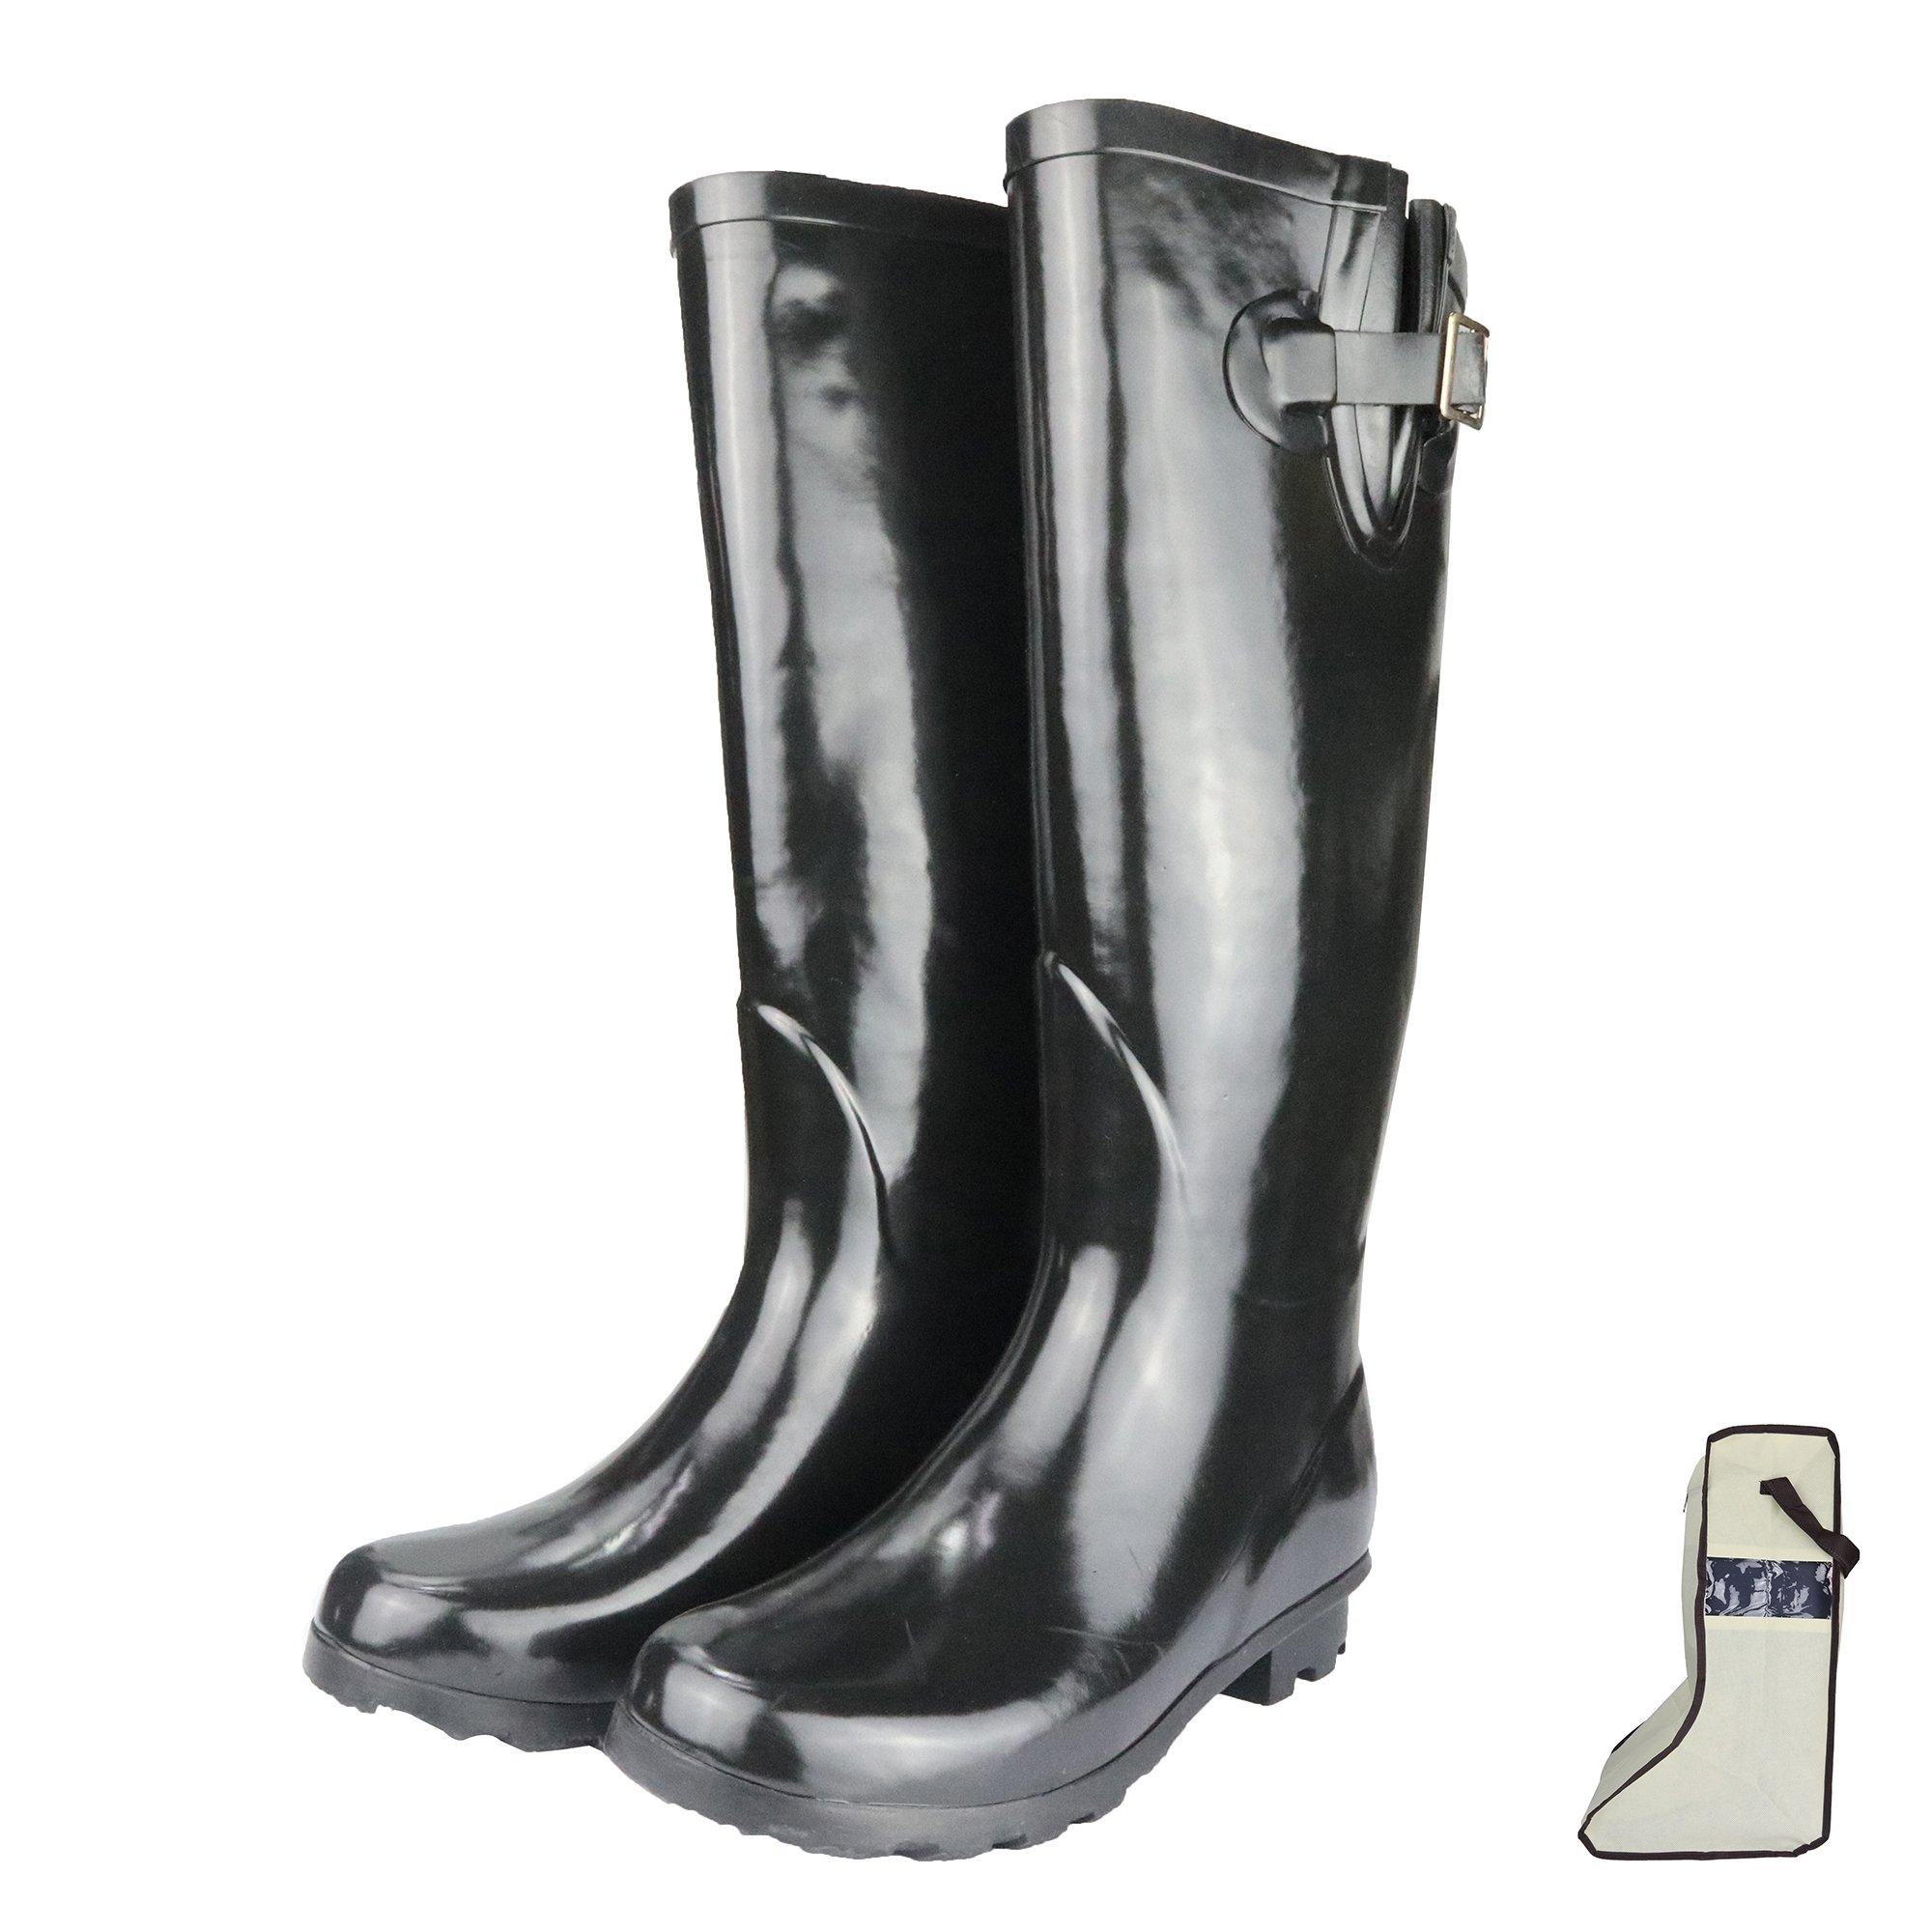 RAHATA Rubber Wide Calf Rain Boots for Women with Storage Bag Carabiner, Black/9 B(M) Us Women